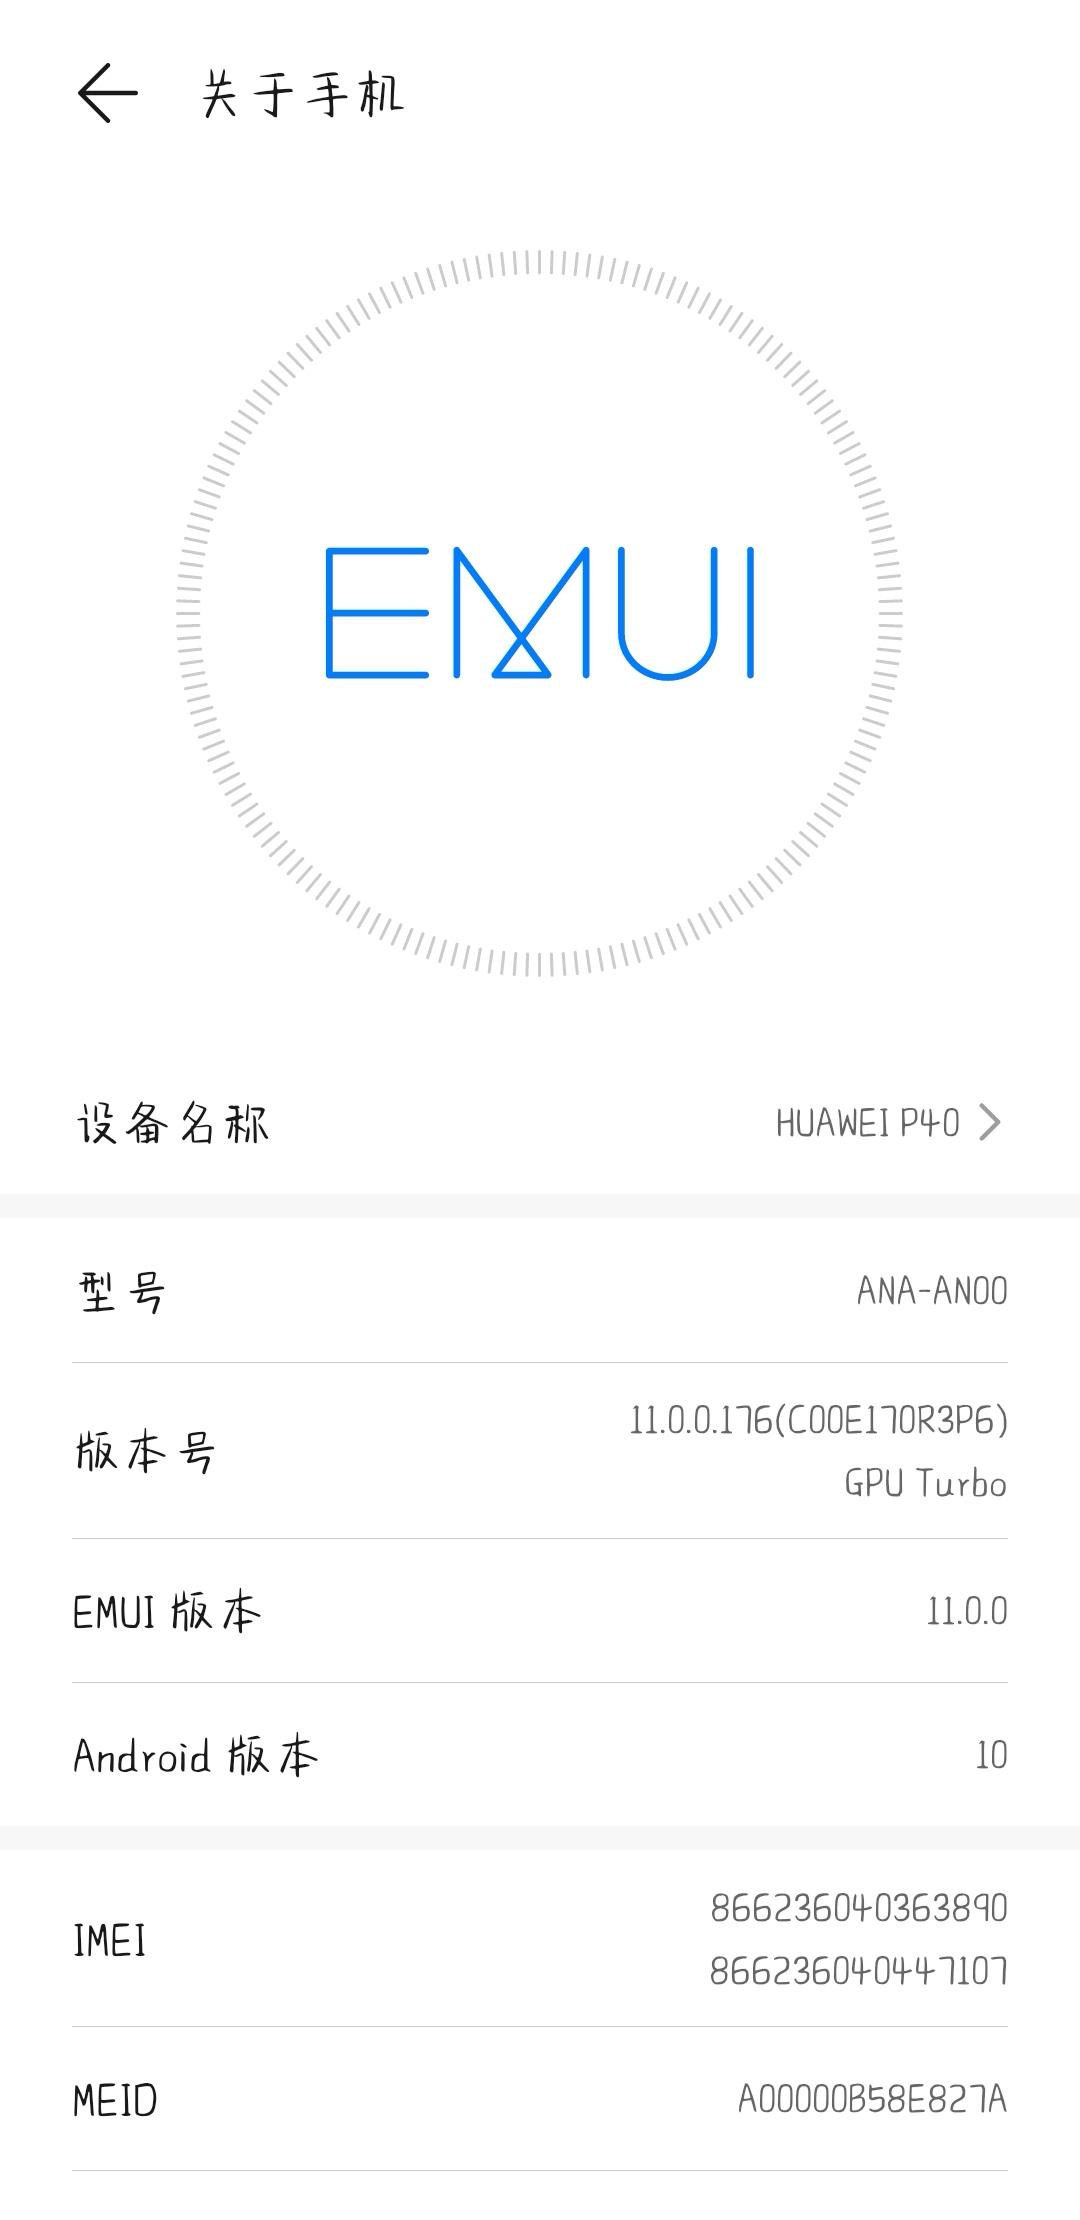 Screenshot_20210512_152629_com.android.settings_edit_991724085016903.jpg